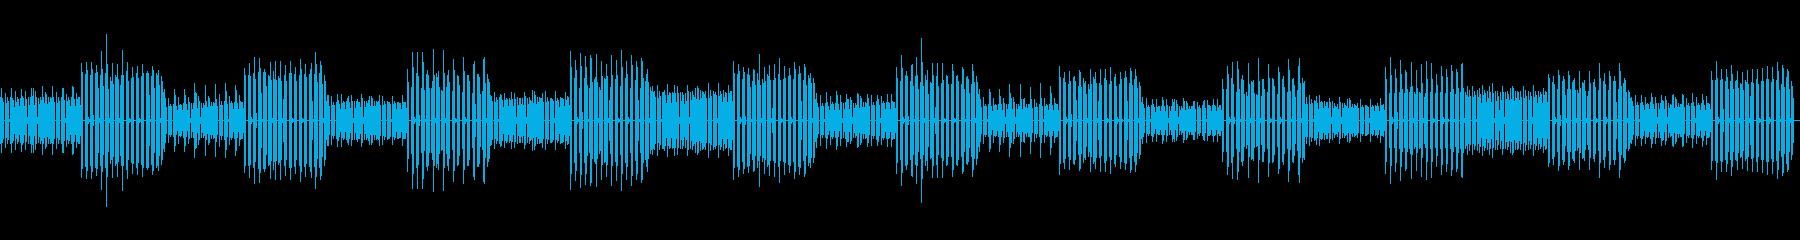 8bit ゲーム内音楽 チップチューン2の再生済みの波形